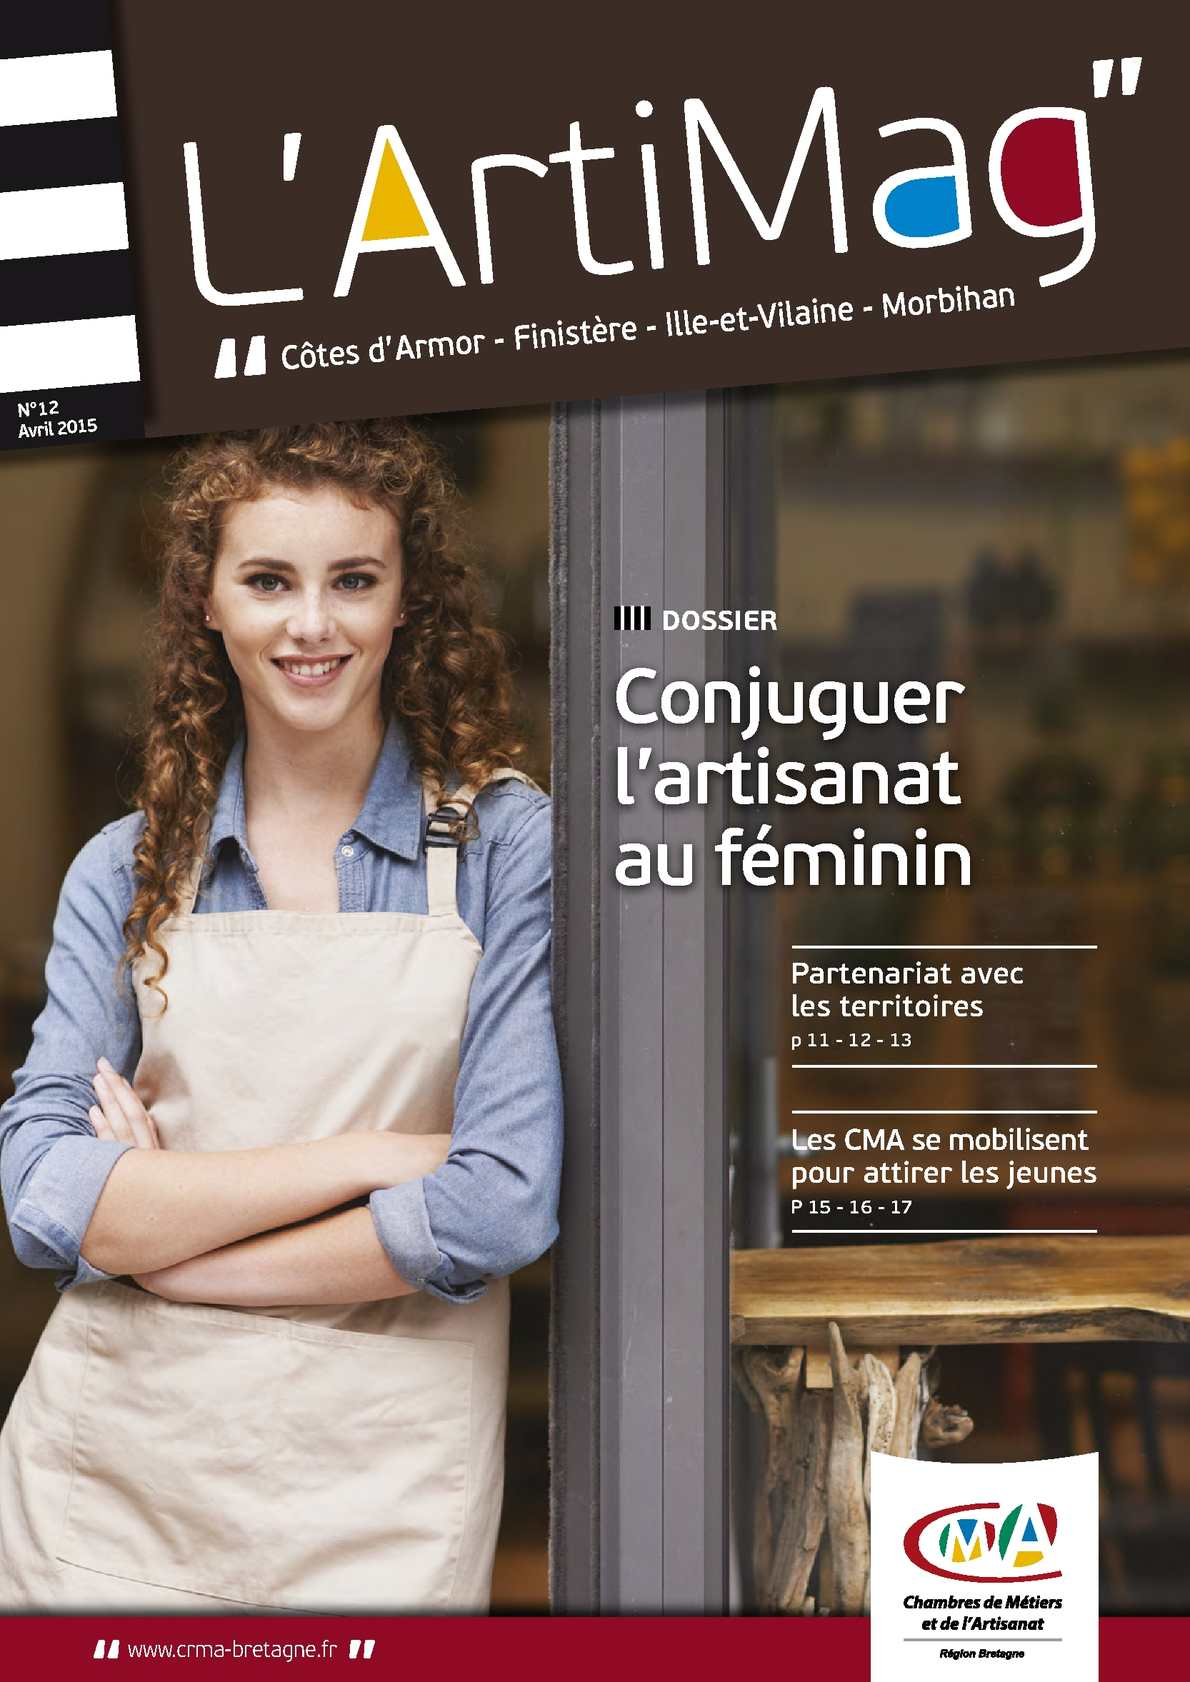 Sophie Pinard La Gacilly calaméo - l'artimag n°12 avril 2015